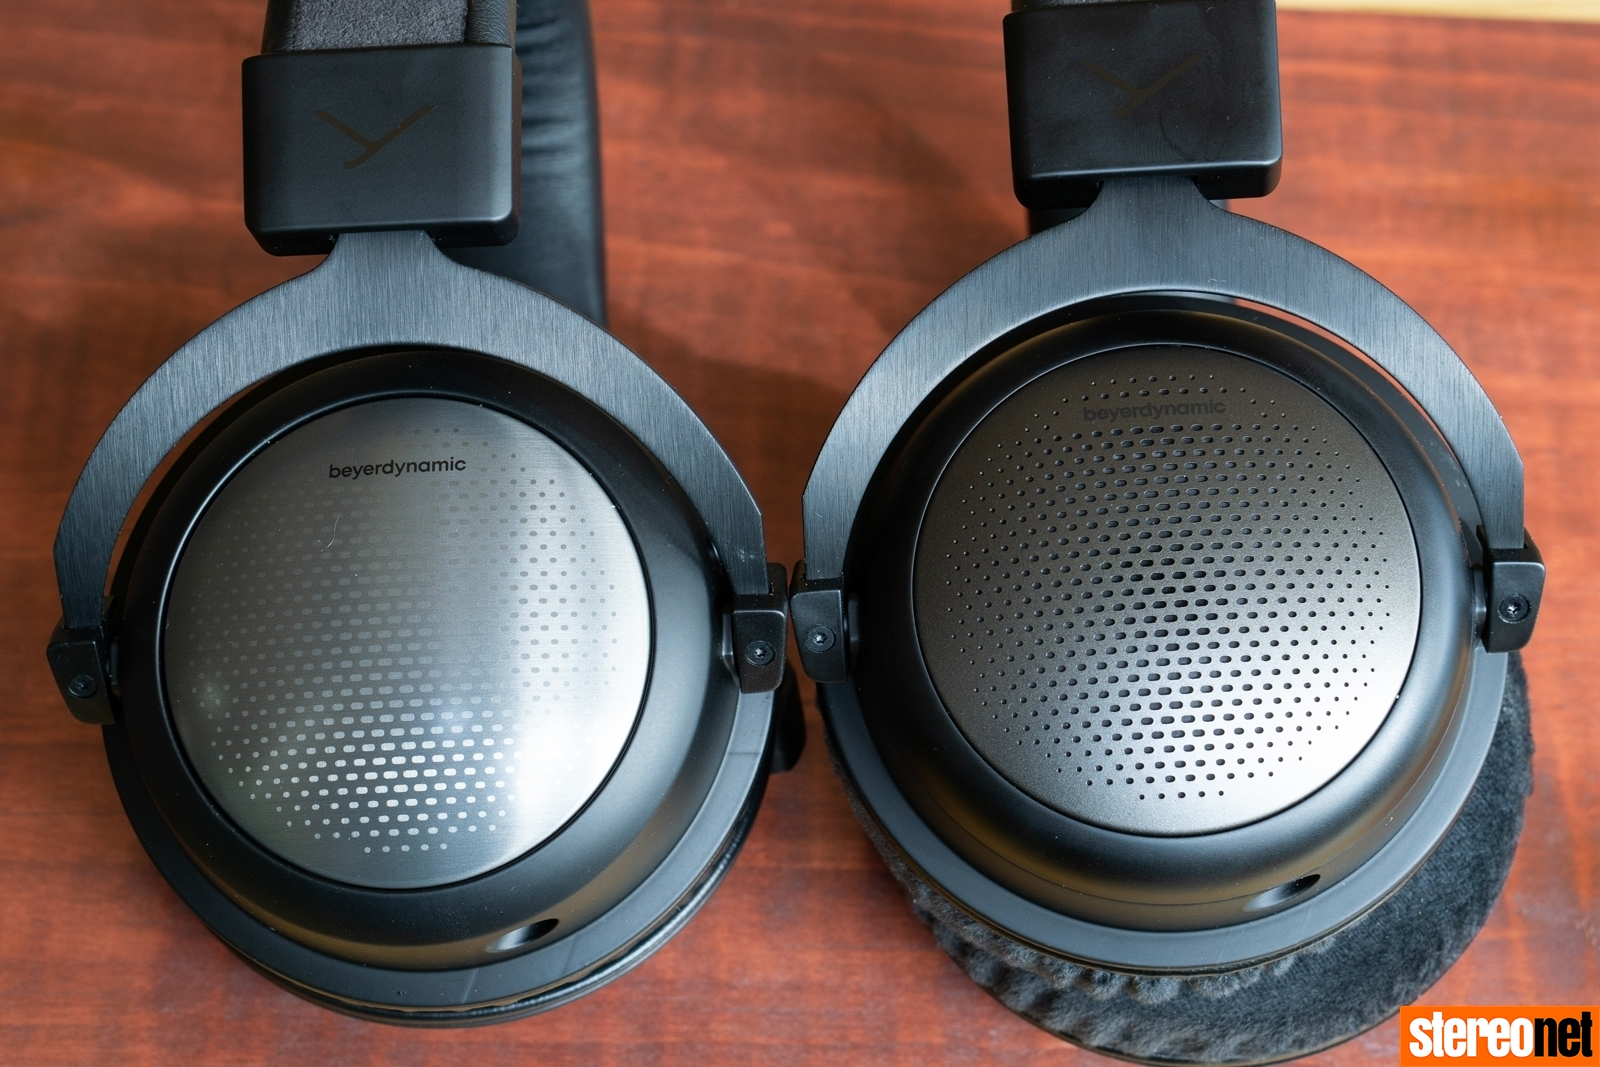 Beyerdynamic T1 and T5 3rd-Gen Headphones Review